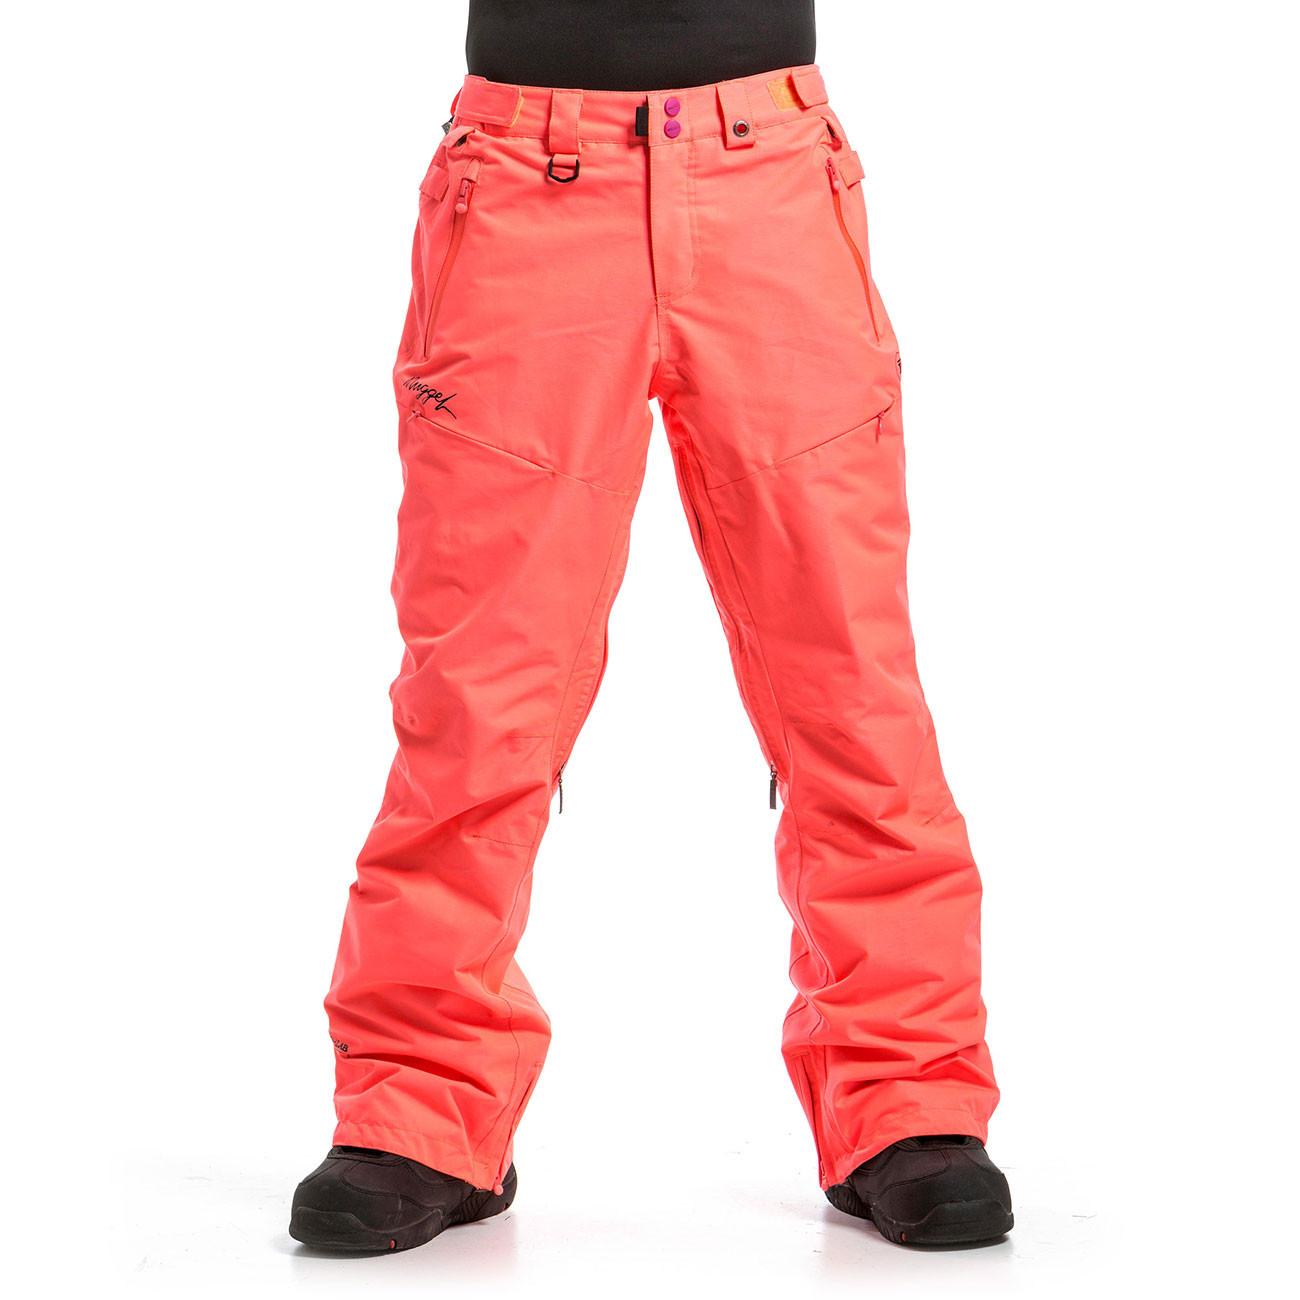 Kalhoty Nugget Vivid 3 acid pink